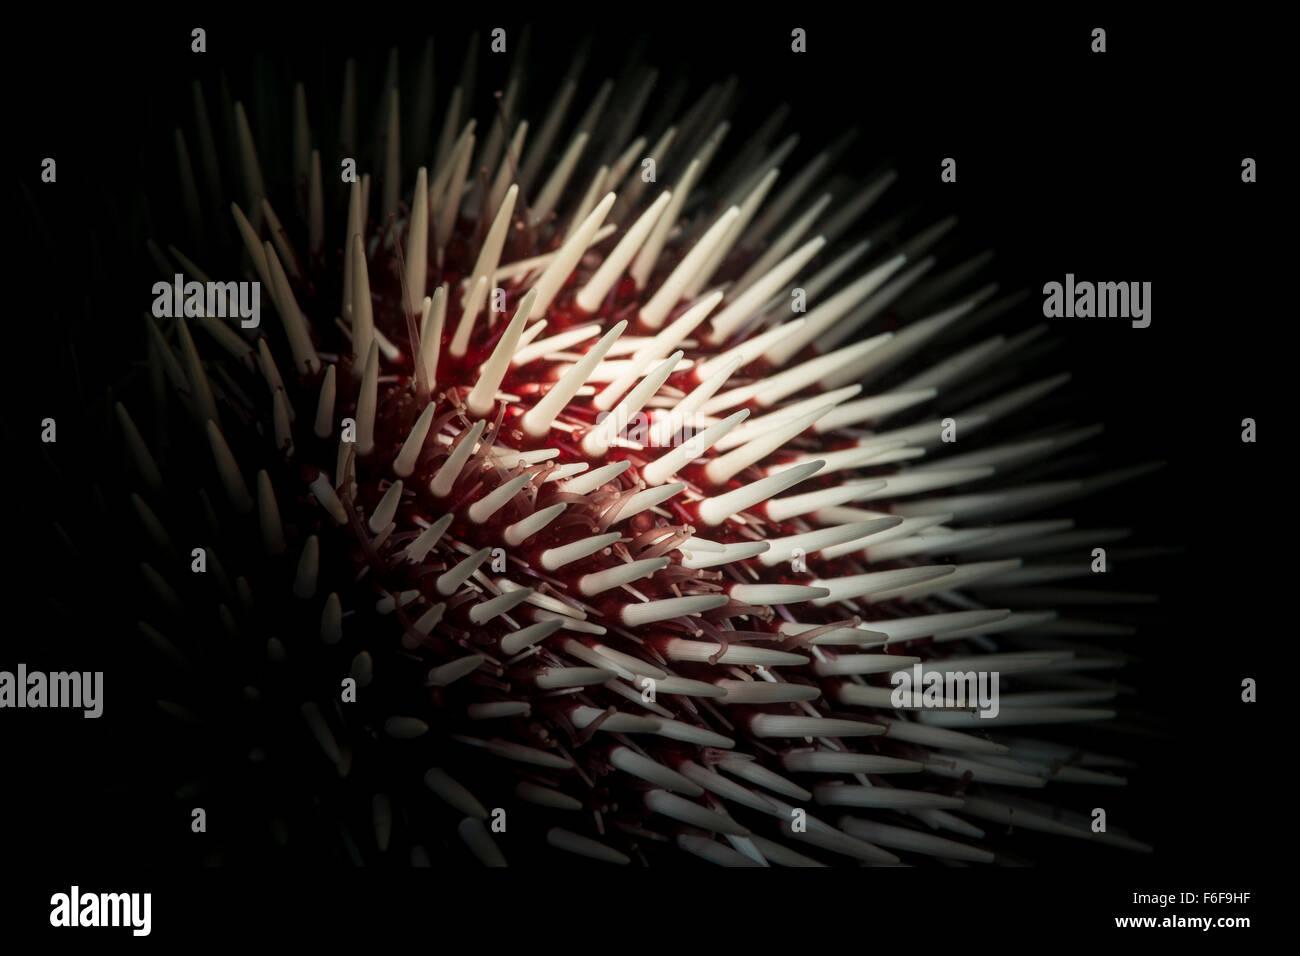 Mediterranean Sea Urchin, Sphaerechinus granularis, Piran, Slovenia - Stock Image